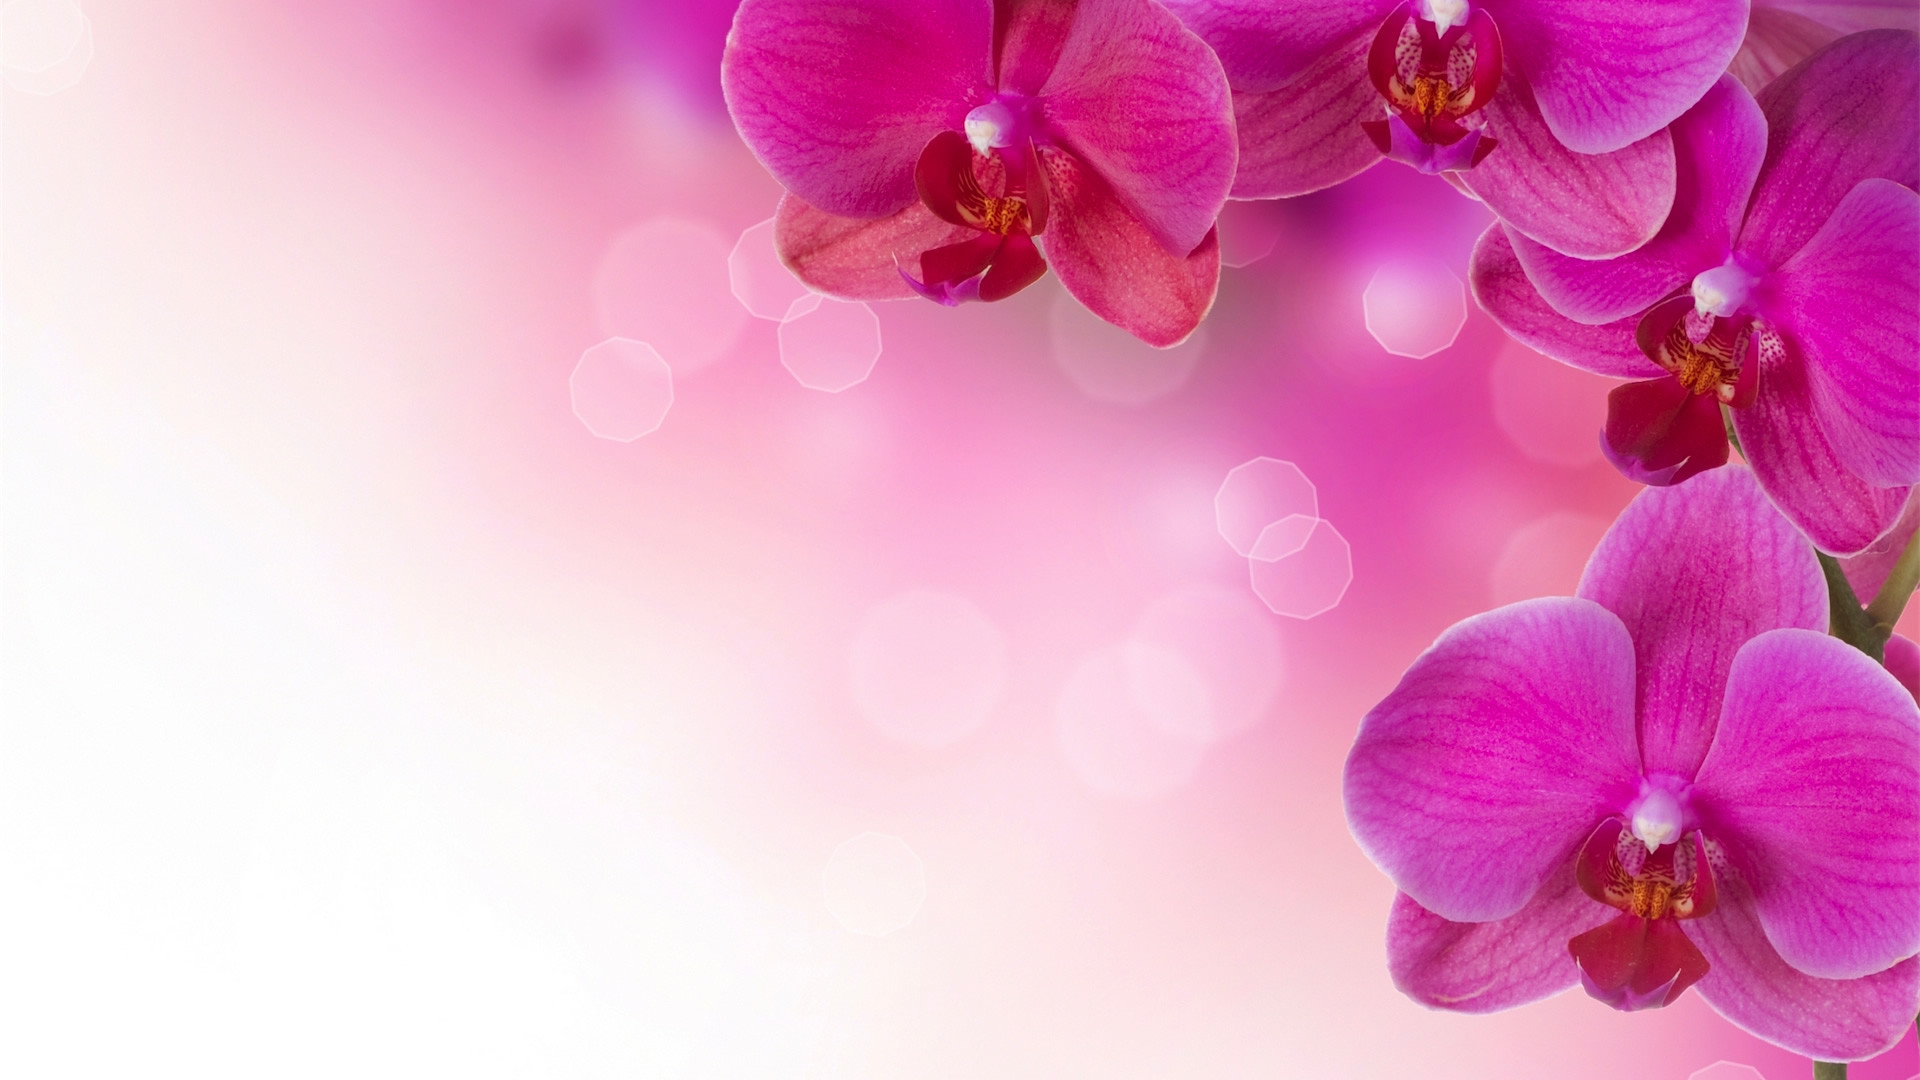 Flower Wallpaper Widescreen pic12fc Background